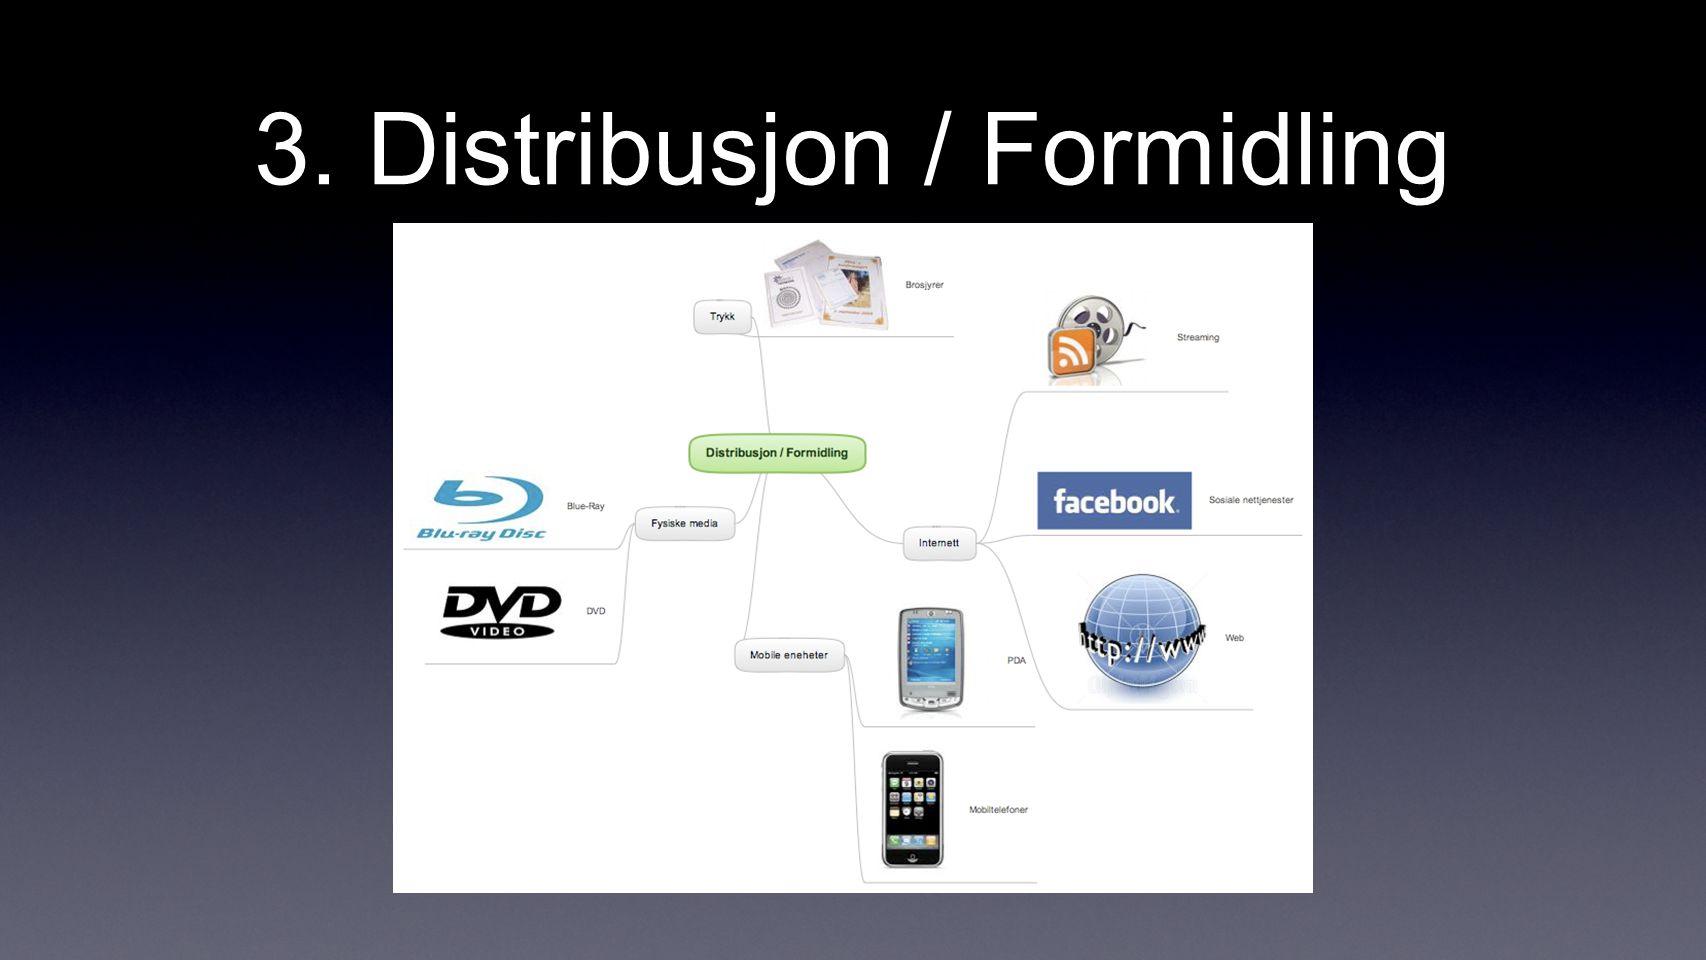 3. Distribusjon / Formidling